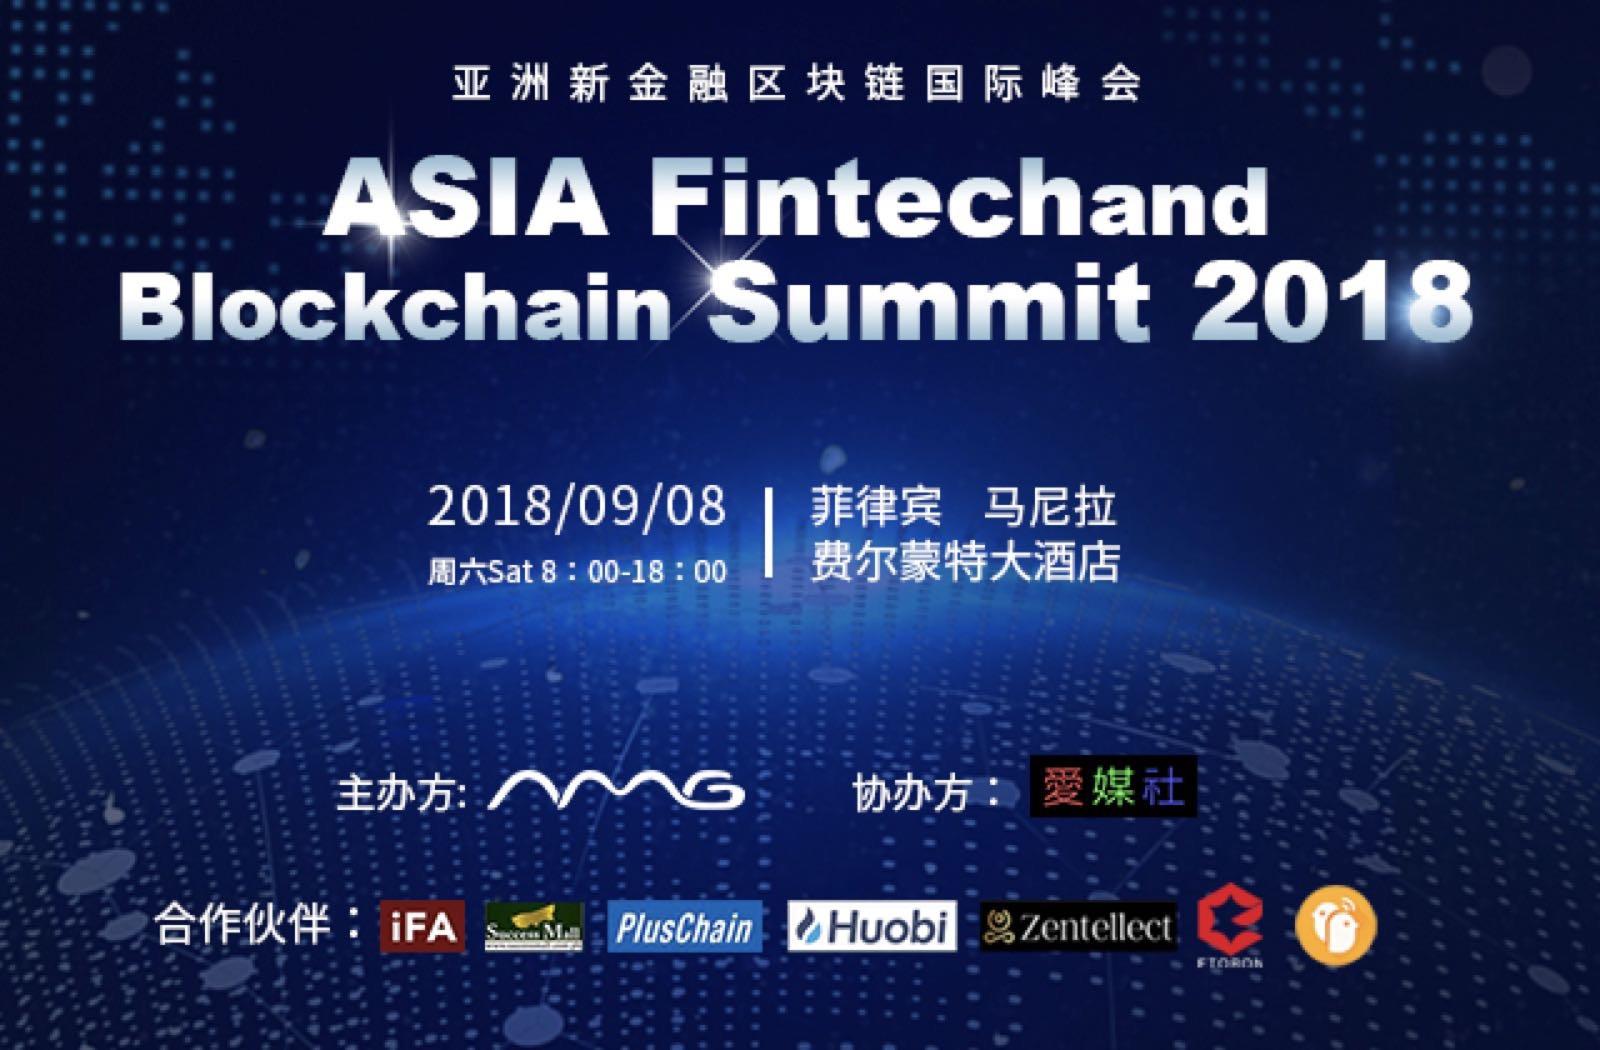 ASIA Fintech and Blockchain Summit2018